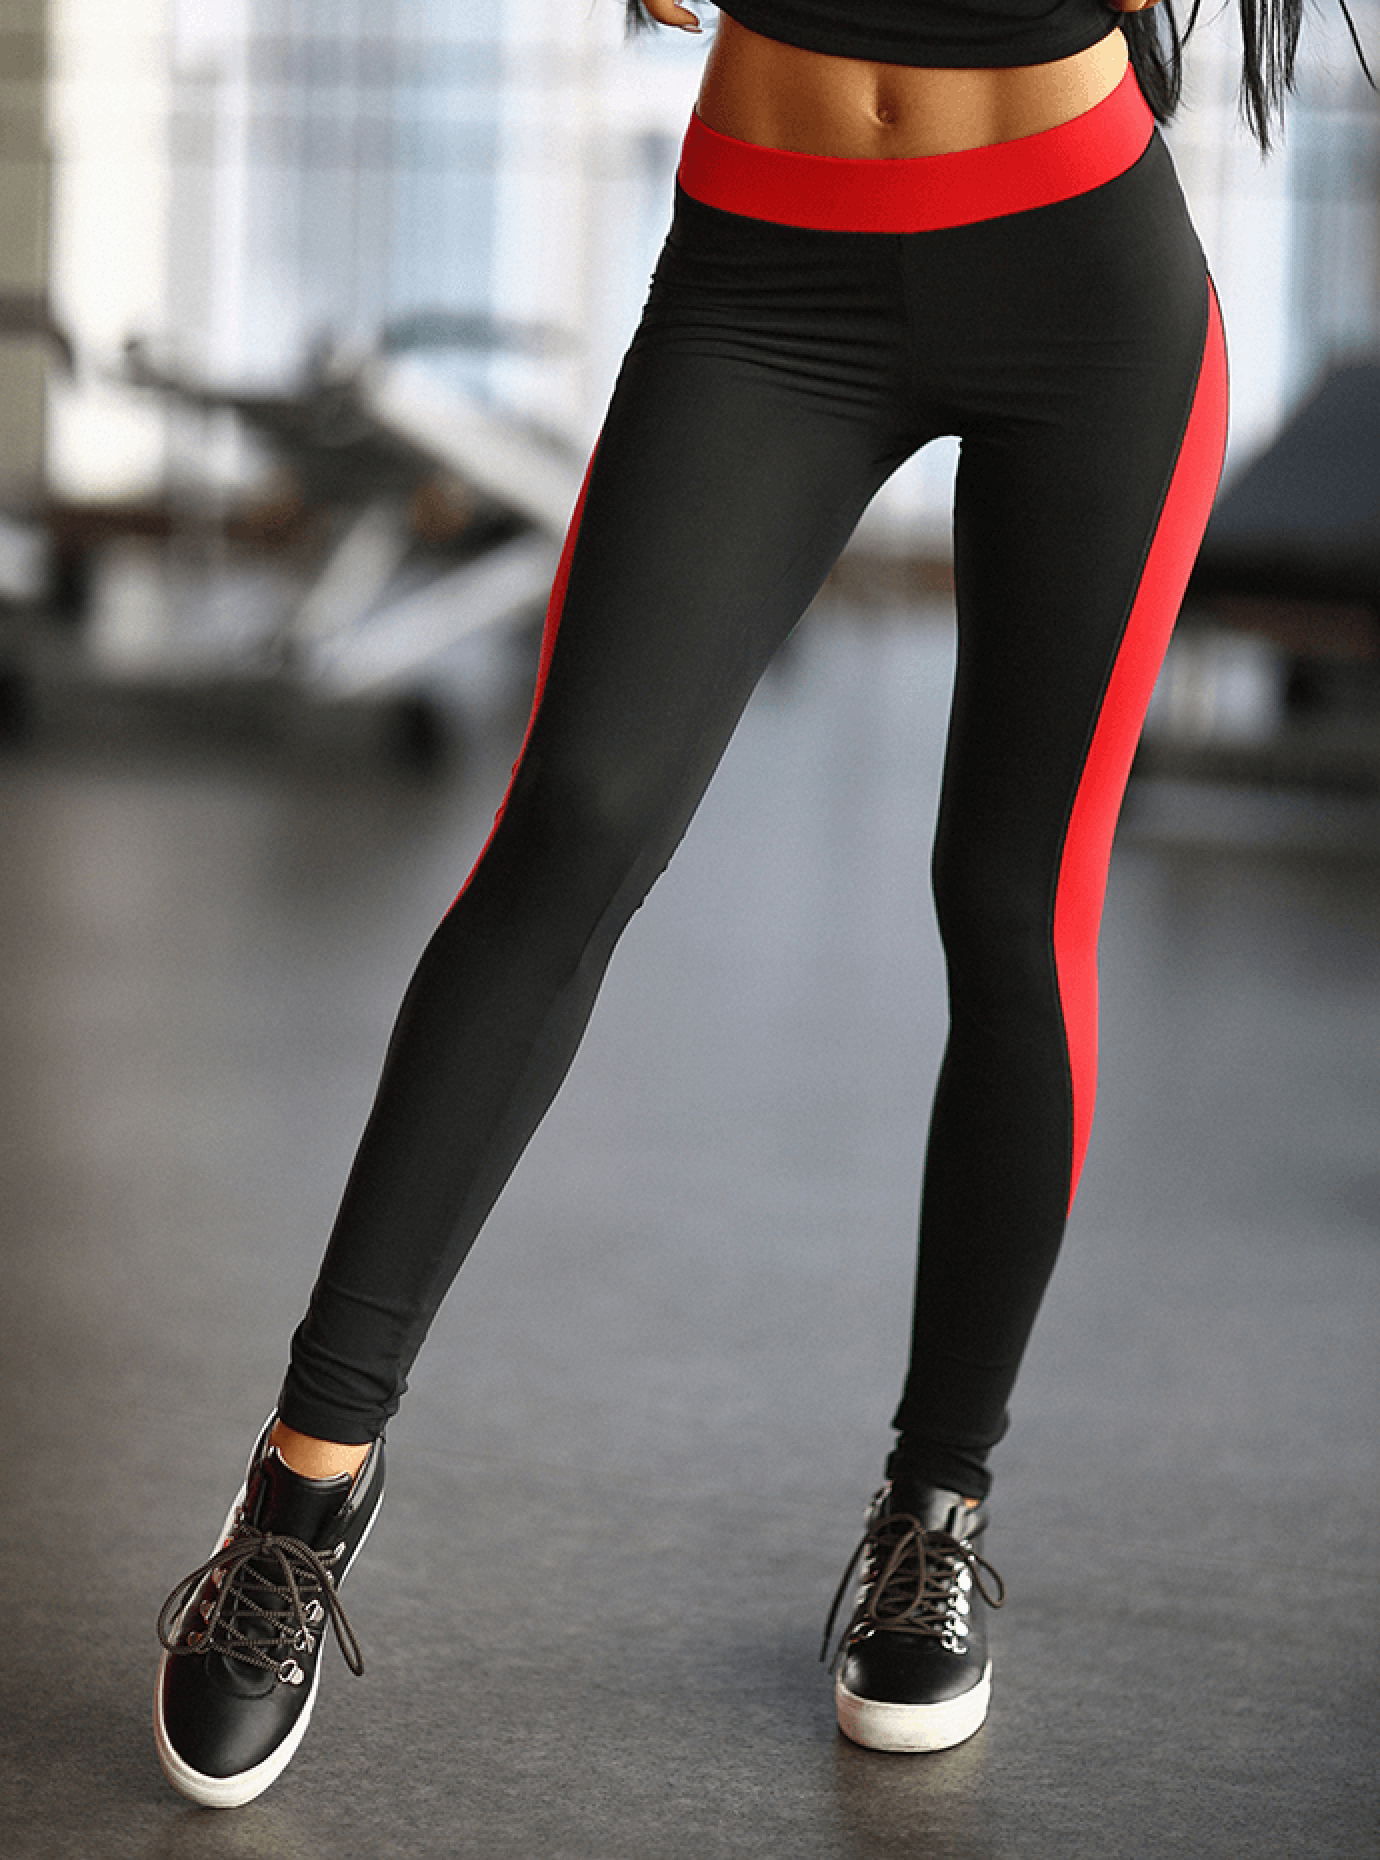 Леггинсы женские Basic Red Серый S (01-F171044): фото - Alster.ua